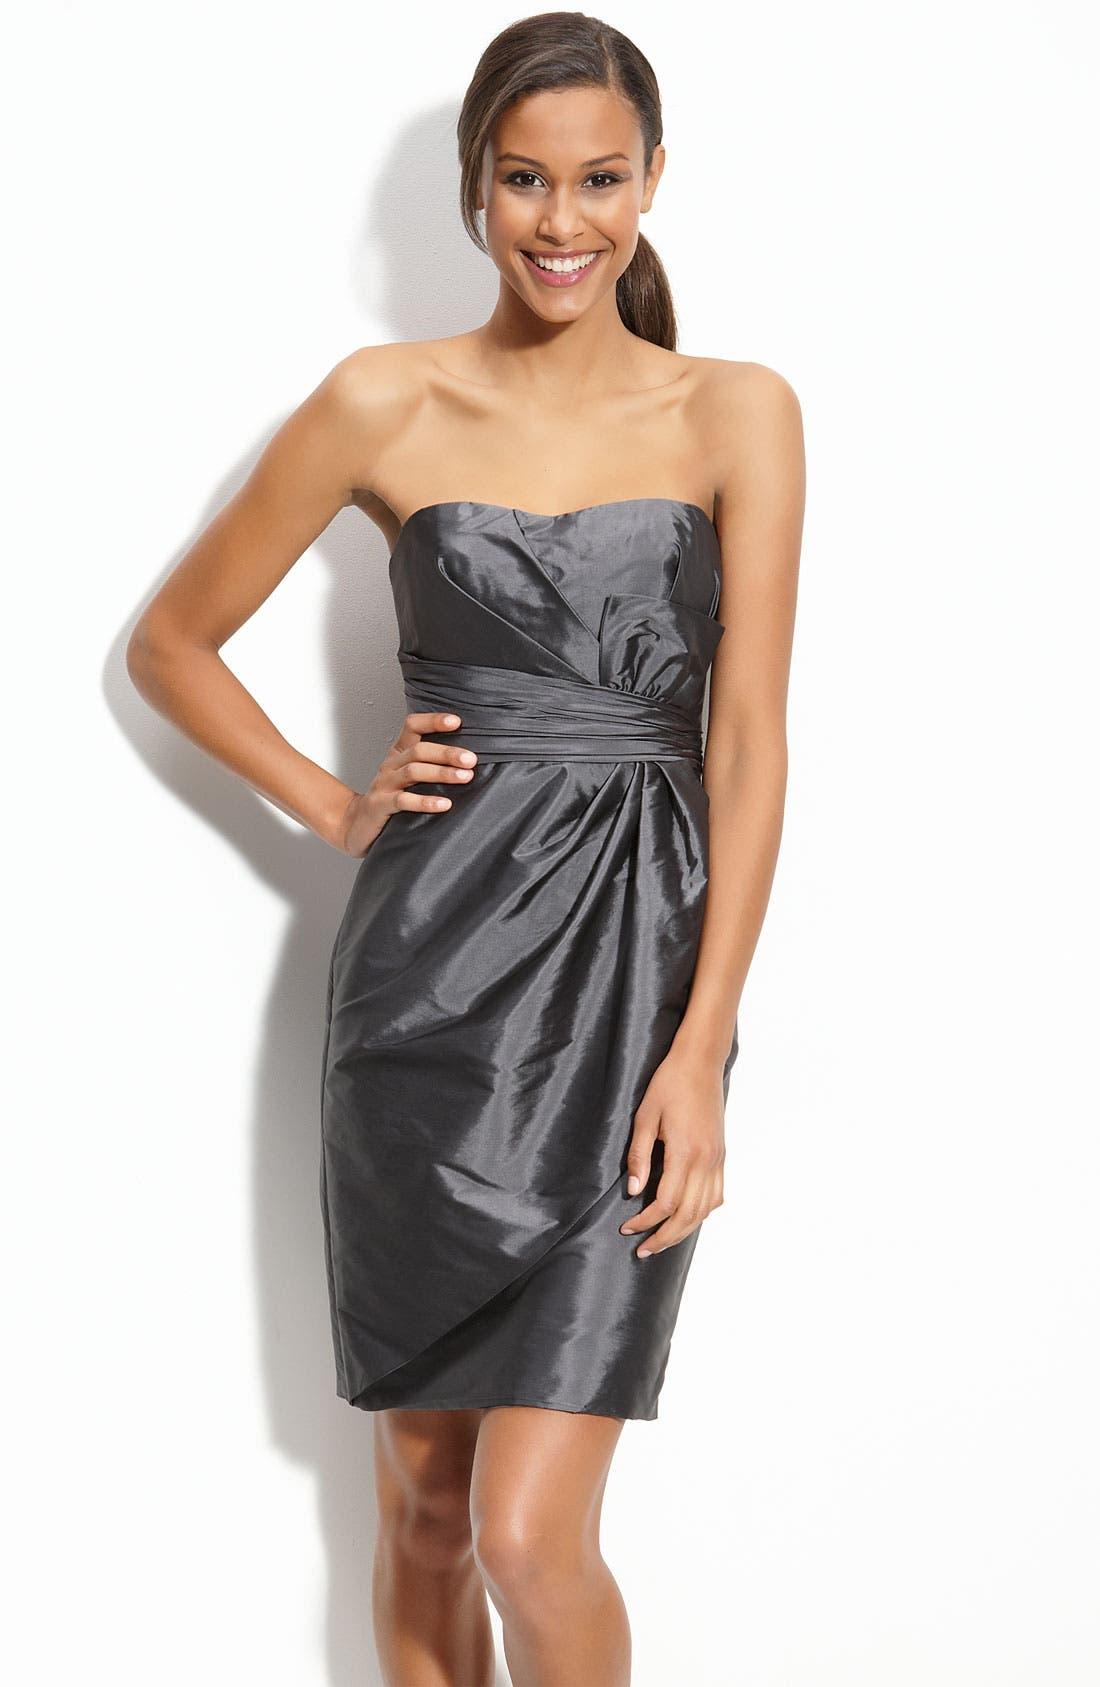 Alternate Image 1 Selected - ML Monique Lhuillier Bridesmaids Strapless Taffeta Sheath Dress (Nordstrom Exclusive)